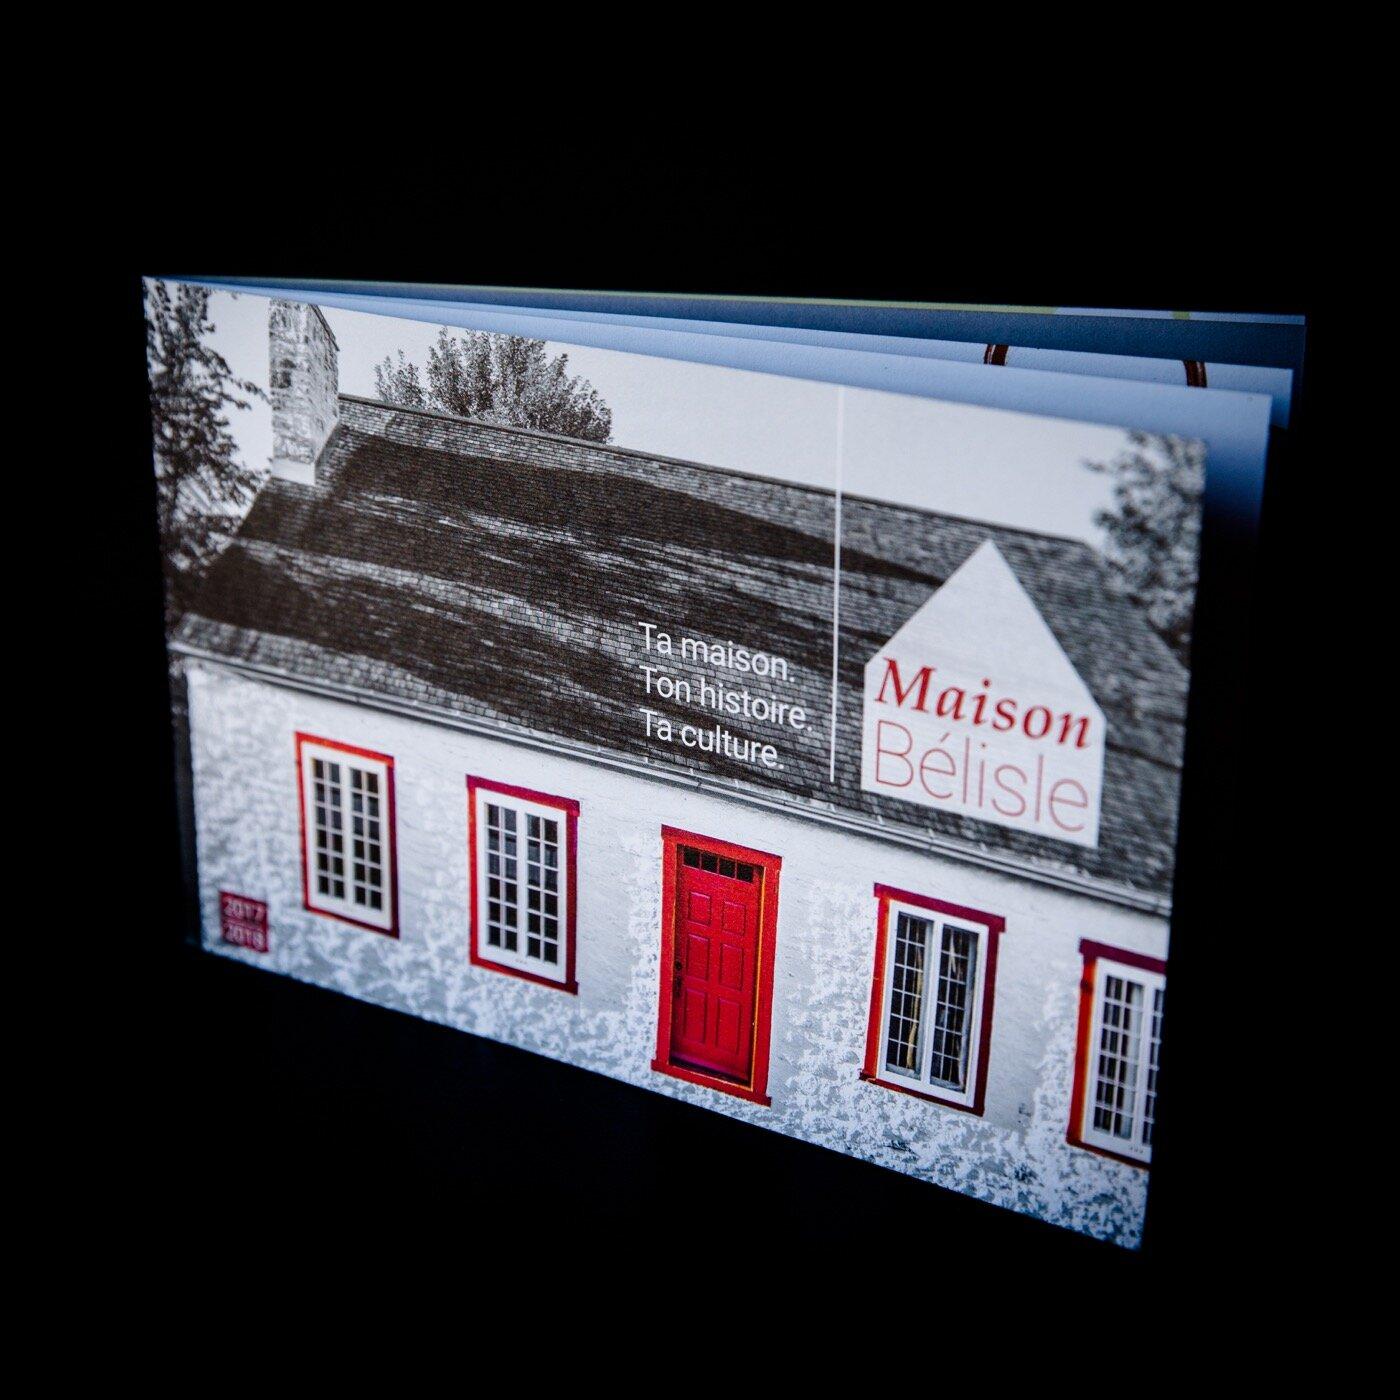 maison-belisle-terrebonne-olivier-lamarre-design-graphiste-1.jpg